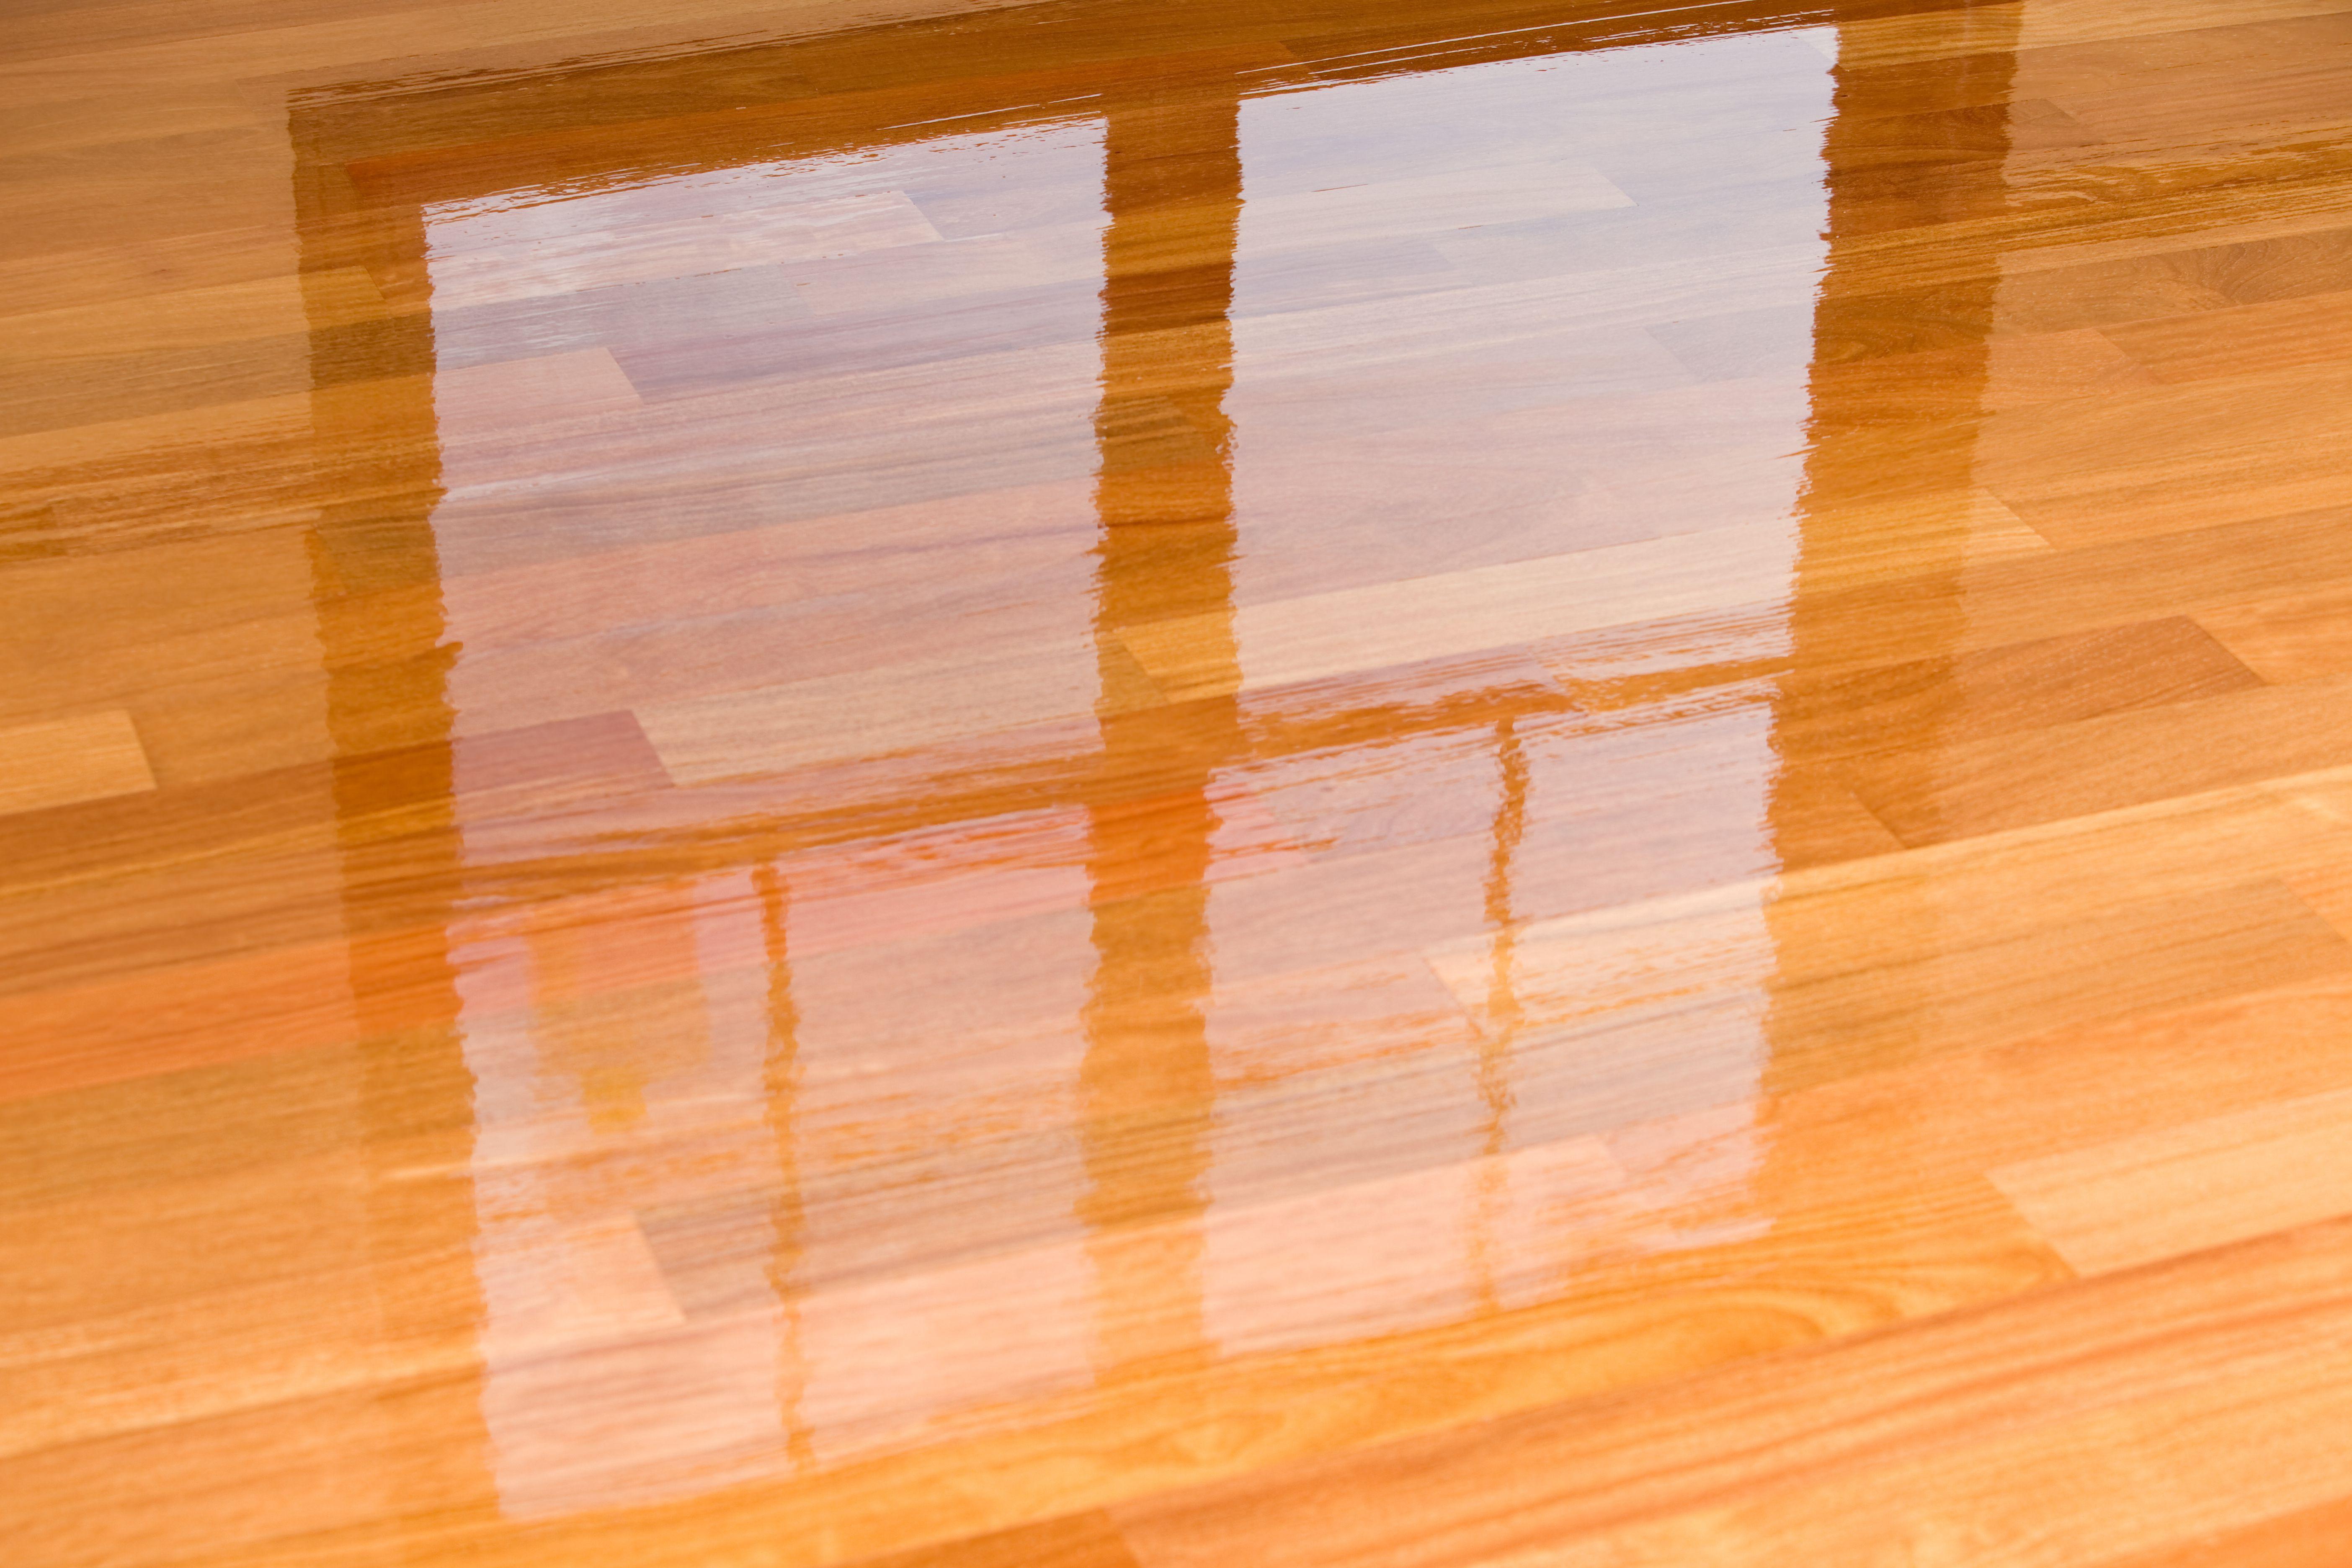 laminate hardwood flooring water damage of guide to laminate flooring water and damage repair with regard to wet polyurethane on new hardwood floor with window reflection 183846705 582e34da3df78c6f6a403968